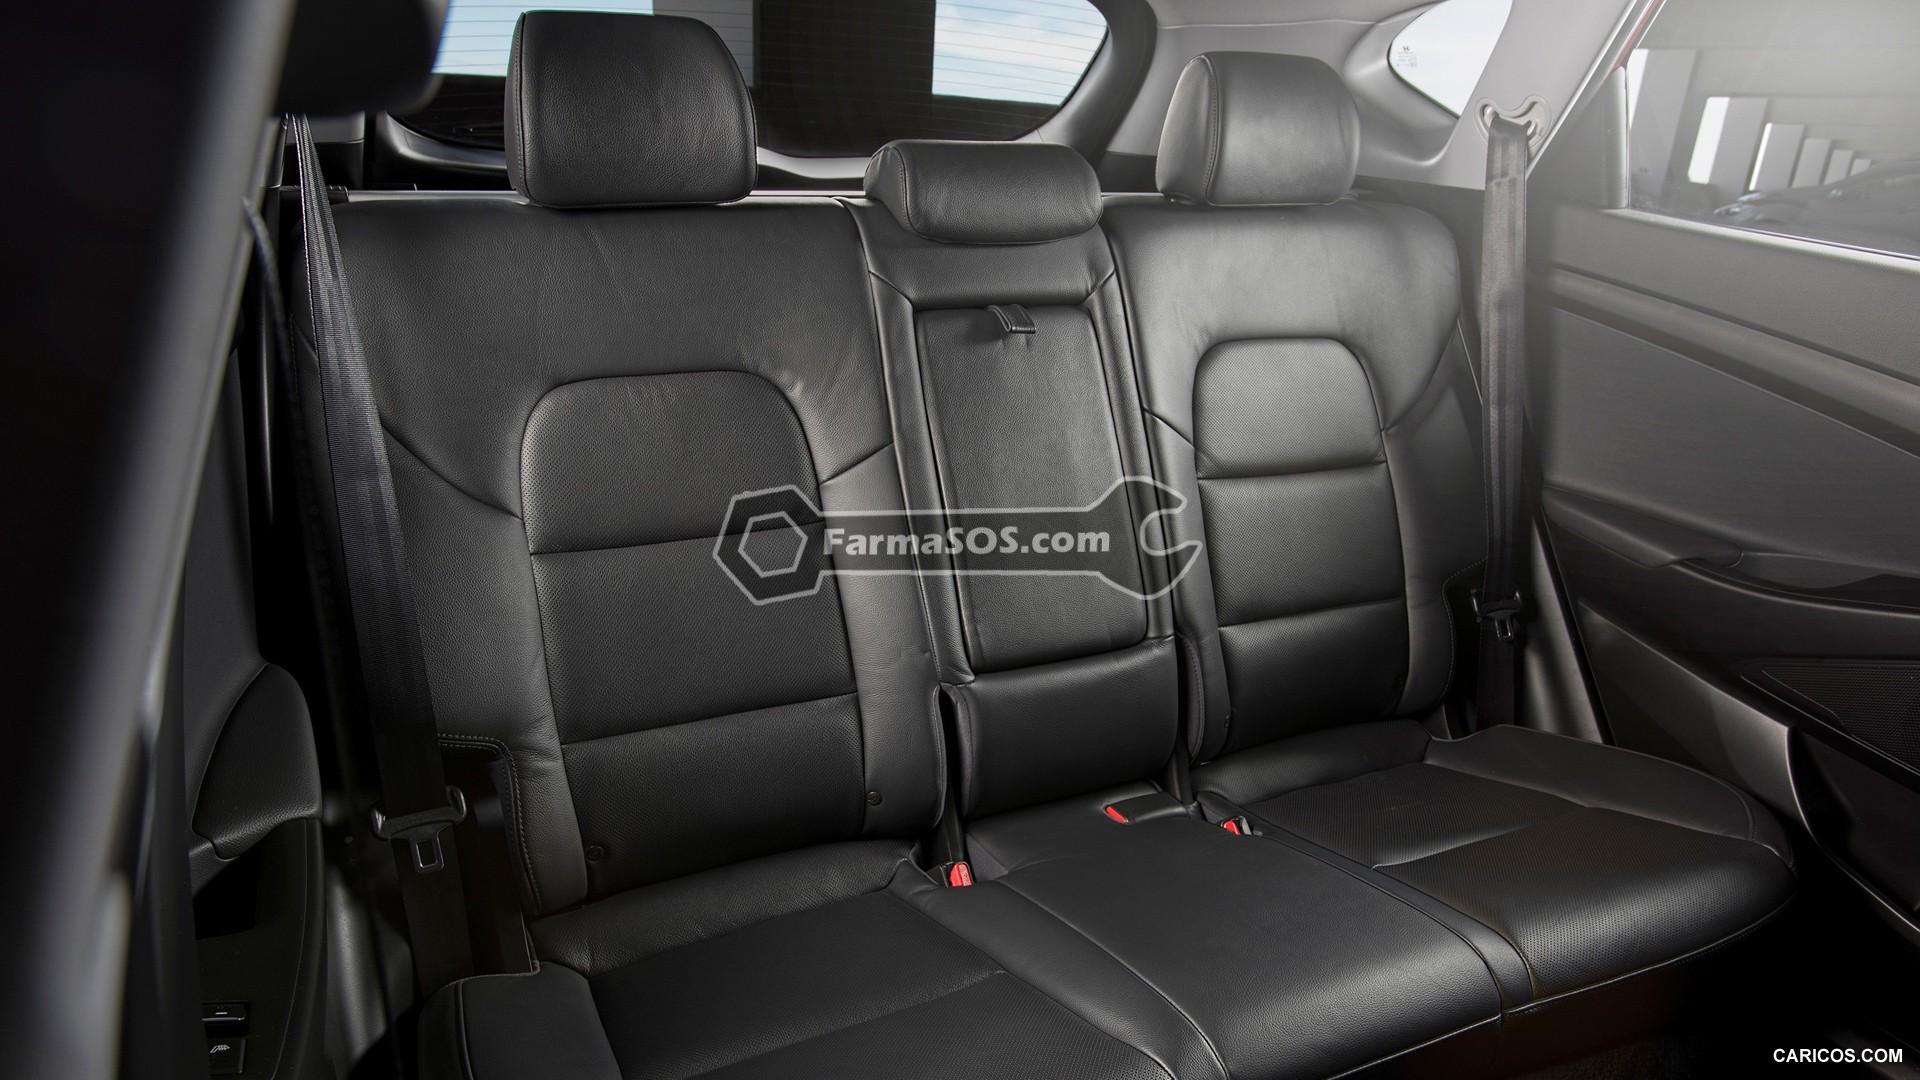 Hyundai Tucson 2015 2017 7 تصاویر هیوندای توسان مدل 2016 تا 2018